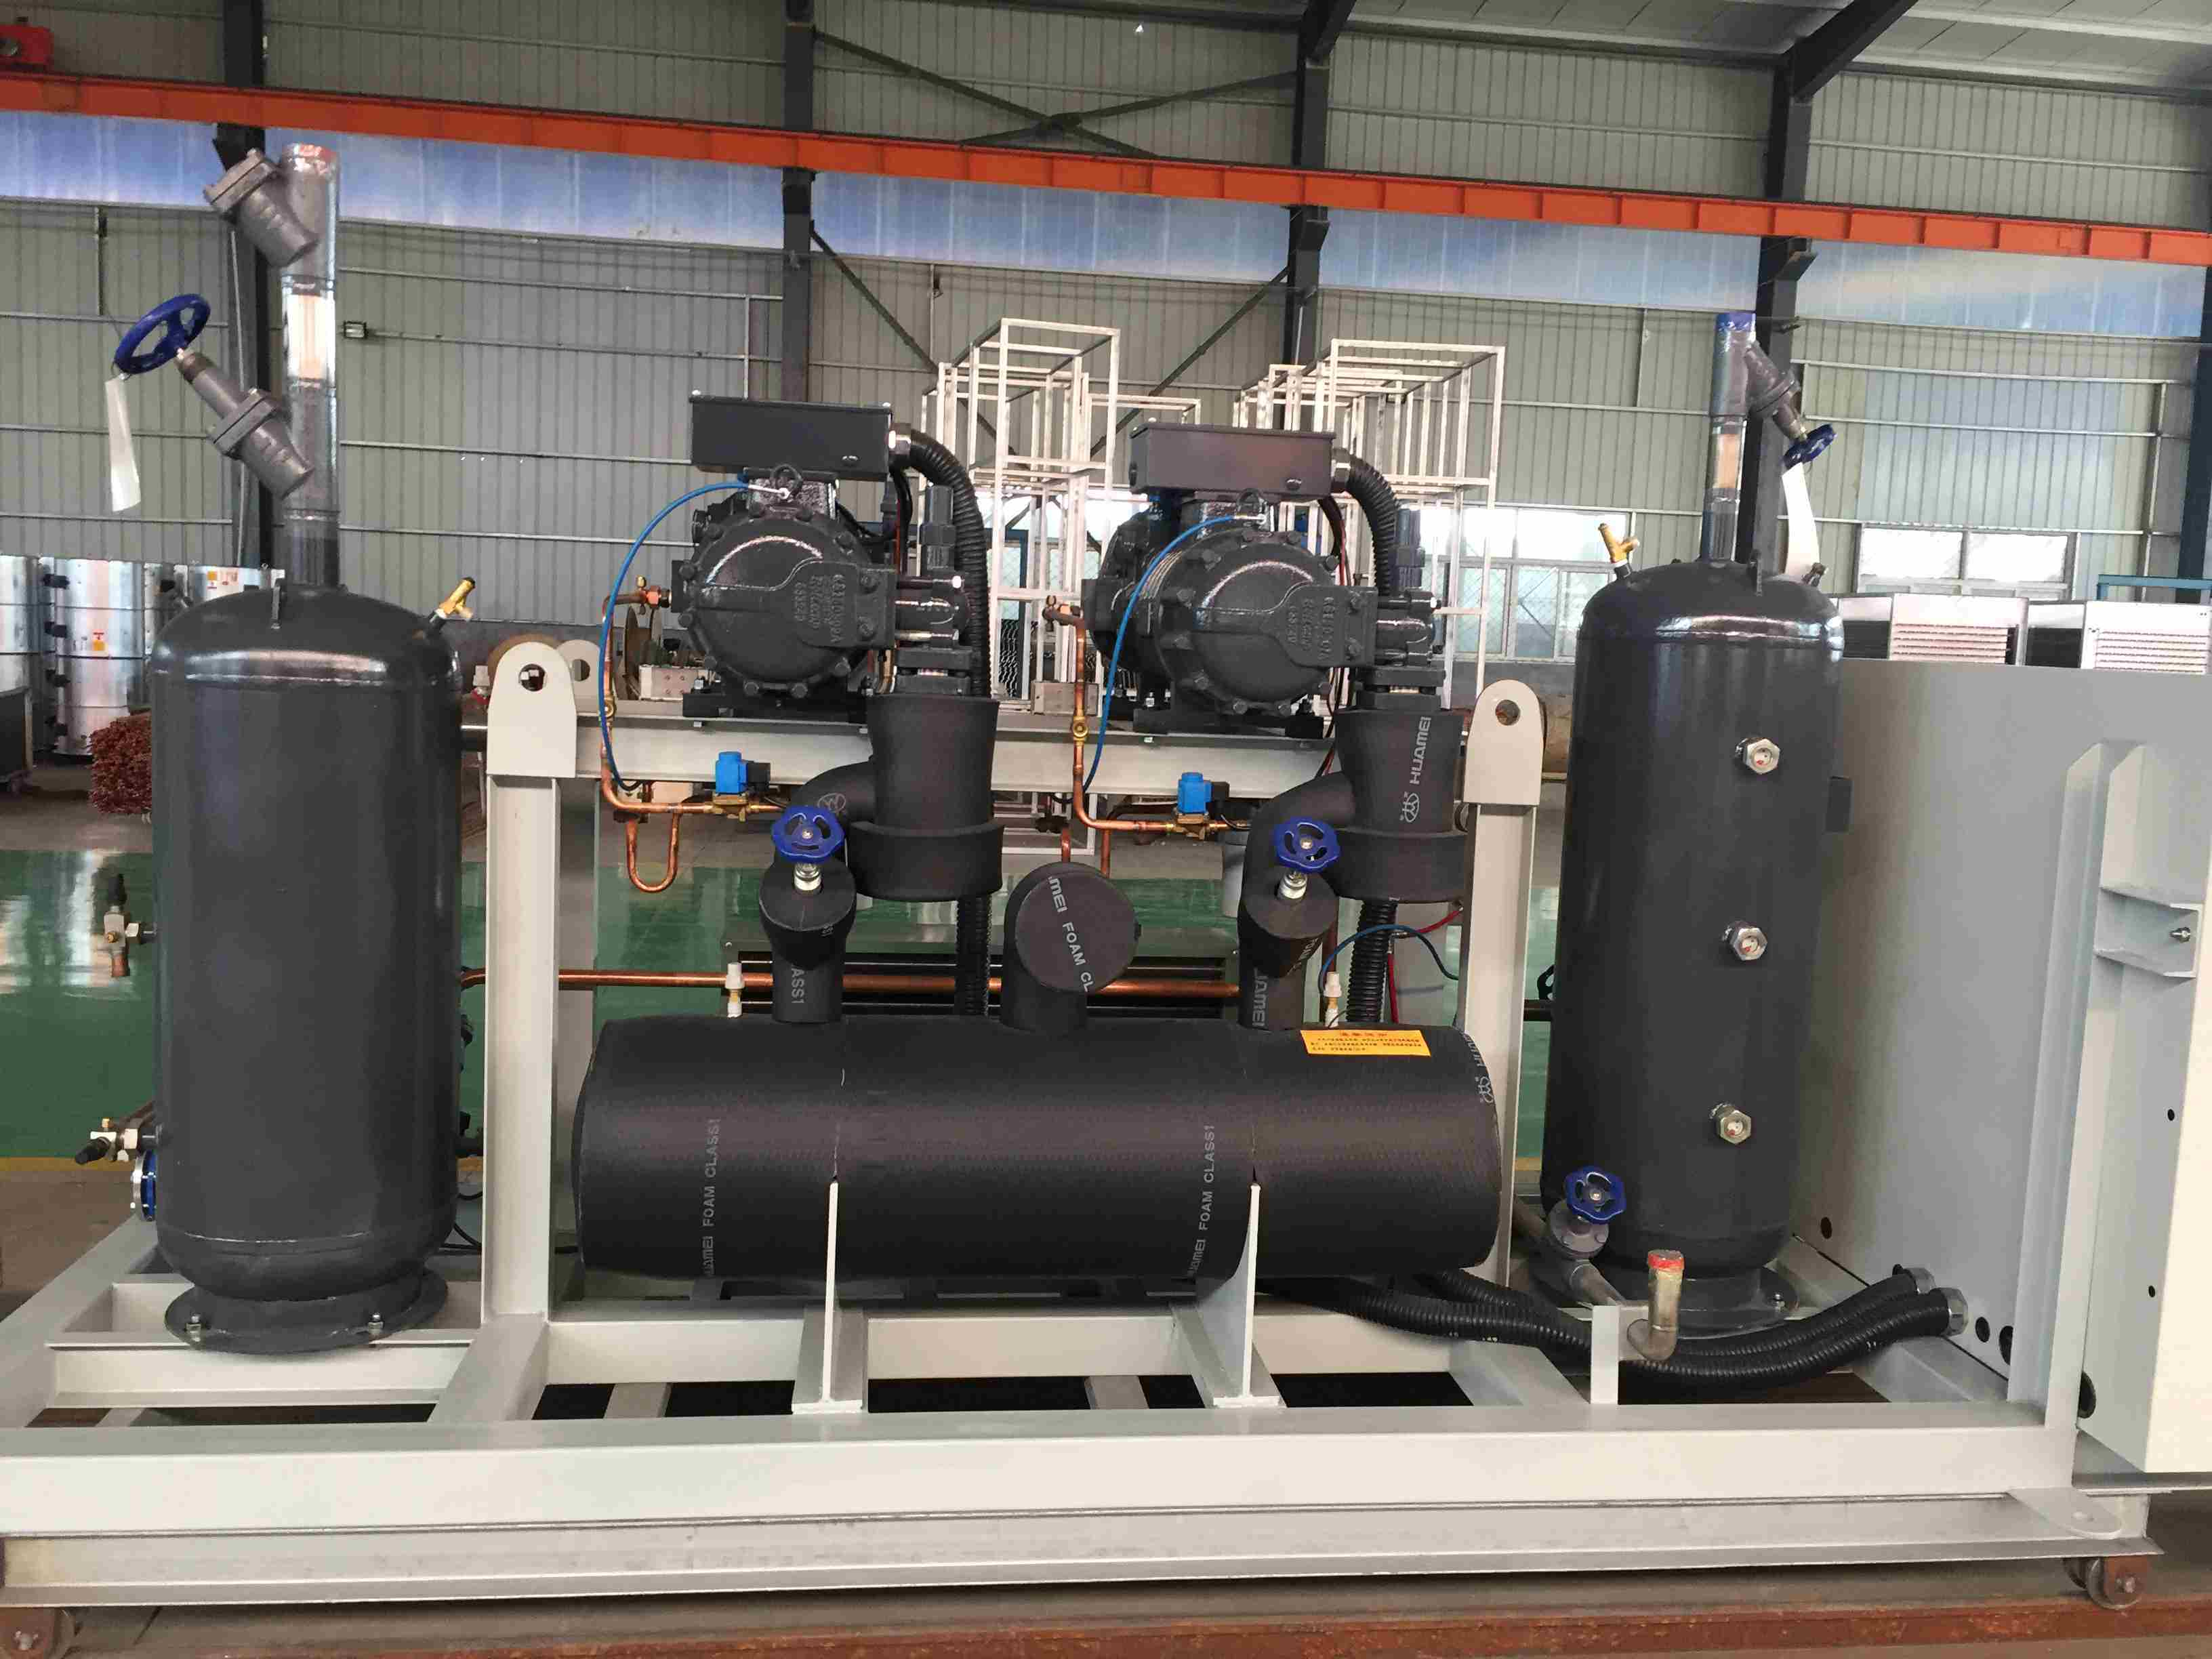 Refcomp High Temperature Screw Parallel Unit Refrigeration Compressor